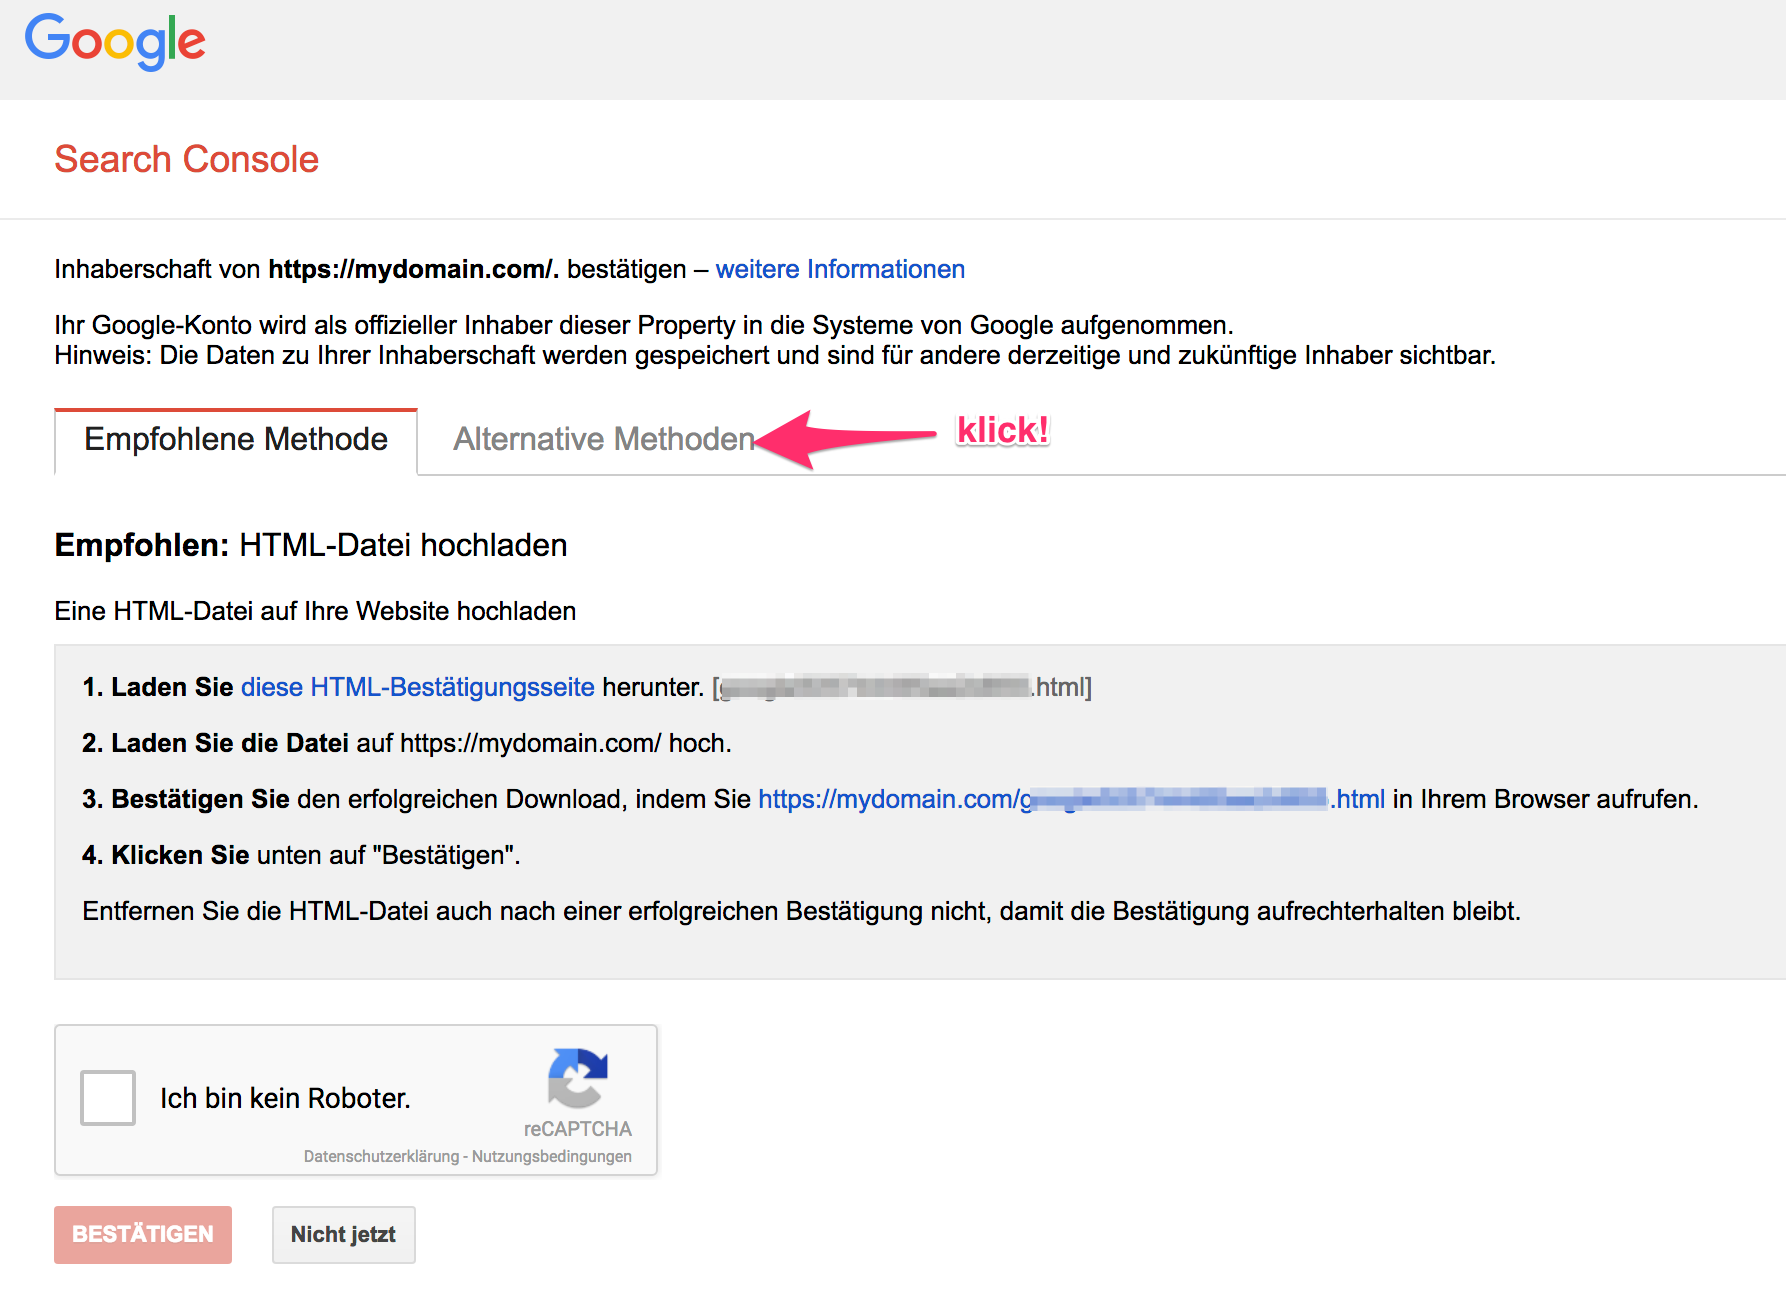 Google Search Console - Verifikation